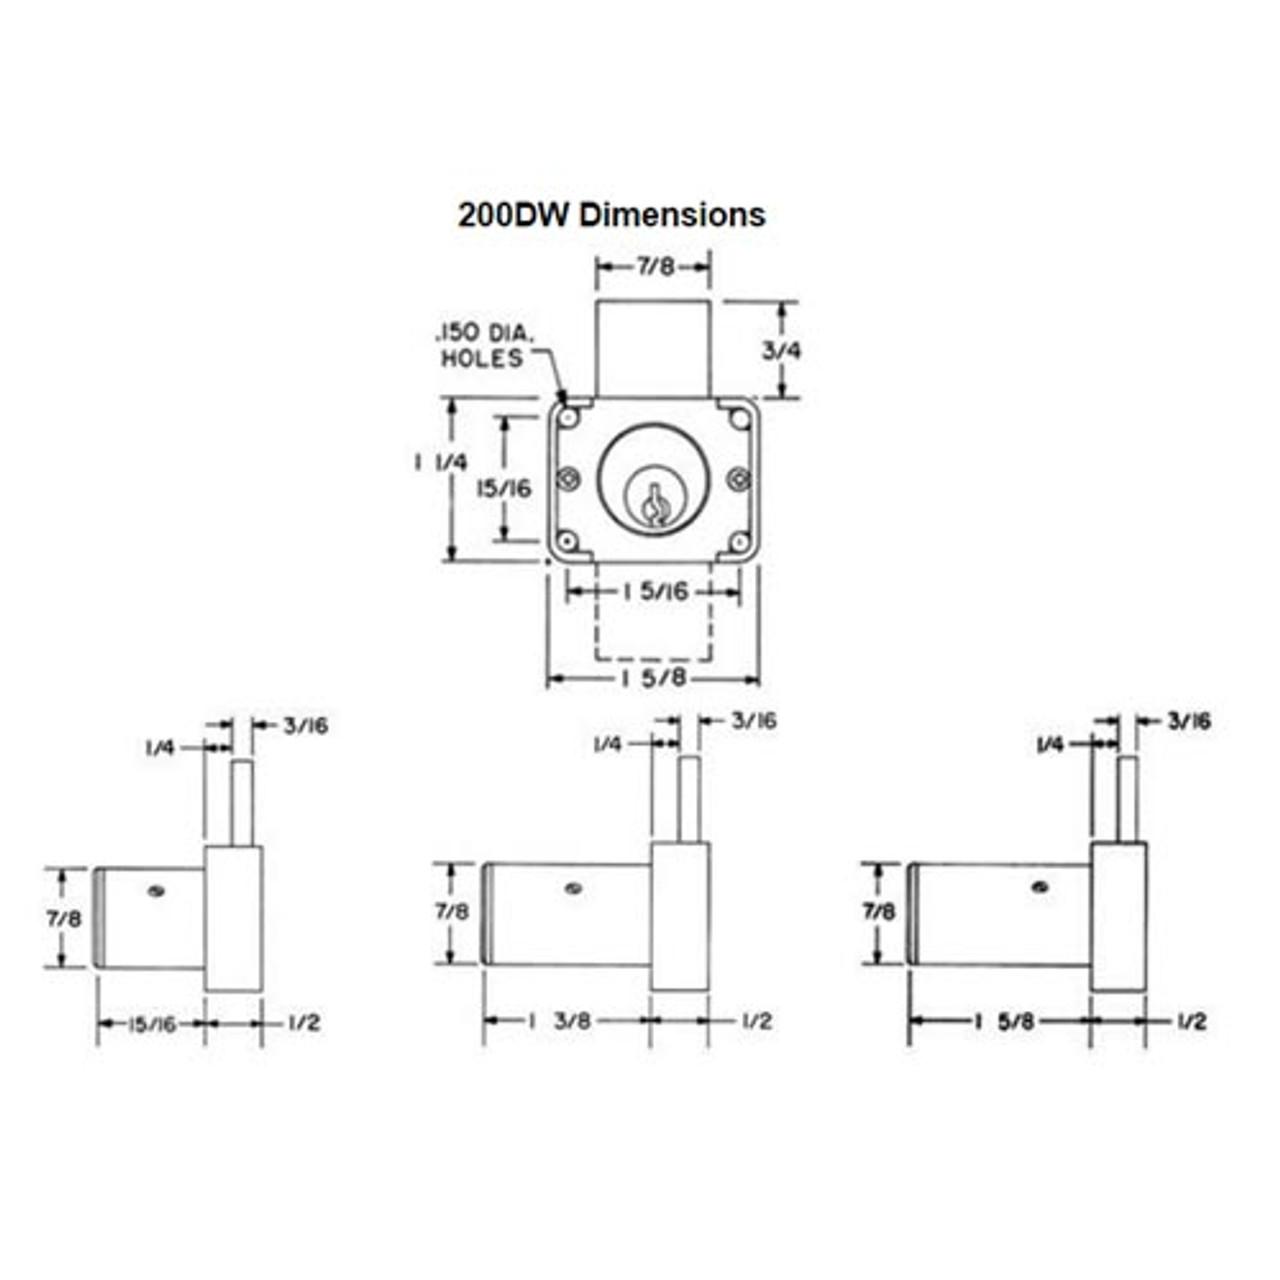 Olympus 200DW-KA915-26D-7/8 N Series Drawer Deadbolt Cabinet Locks in Satin Chrome